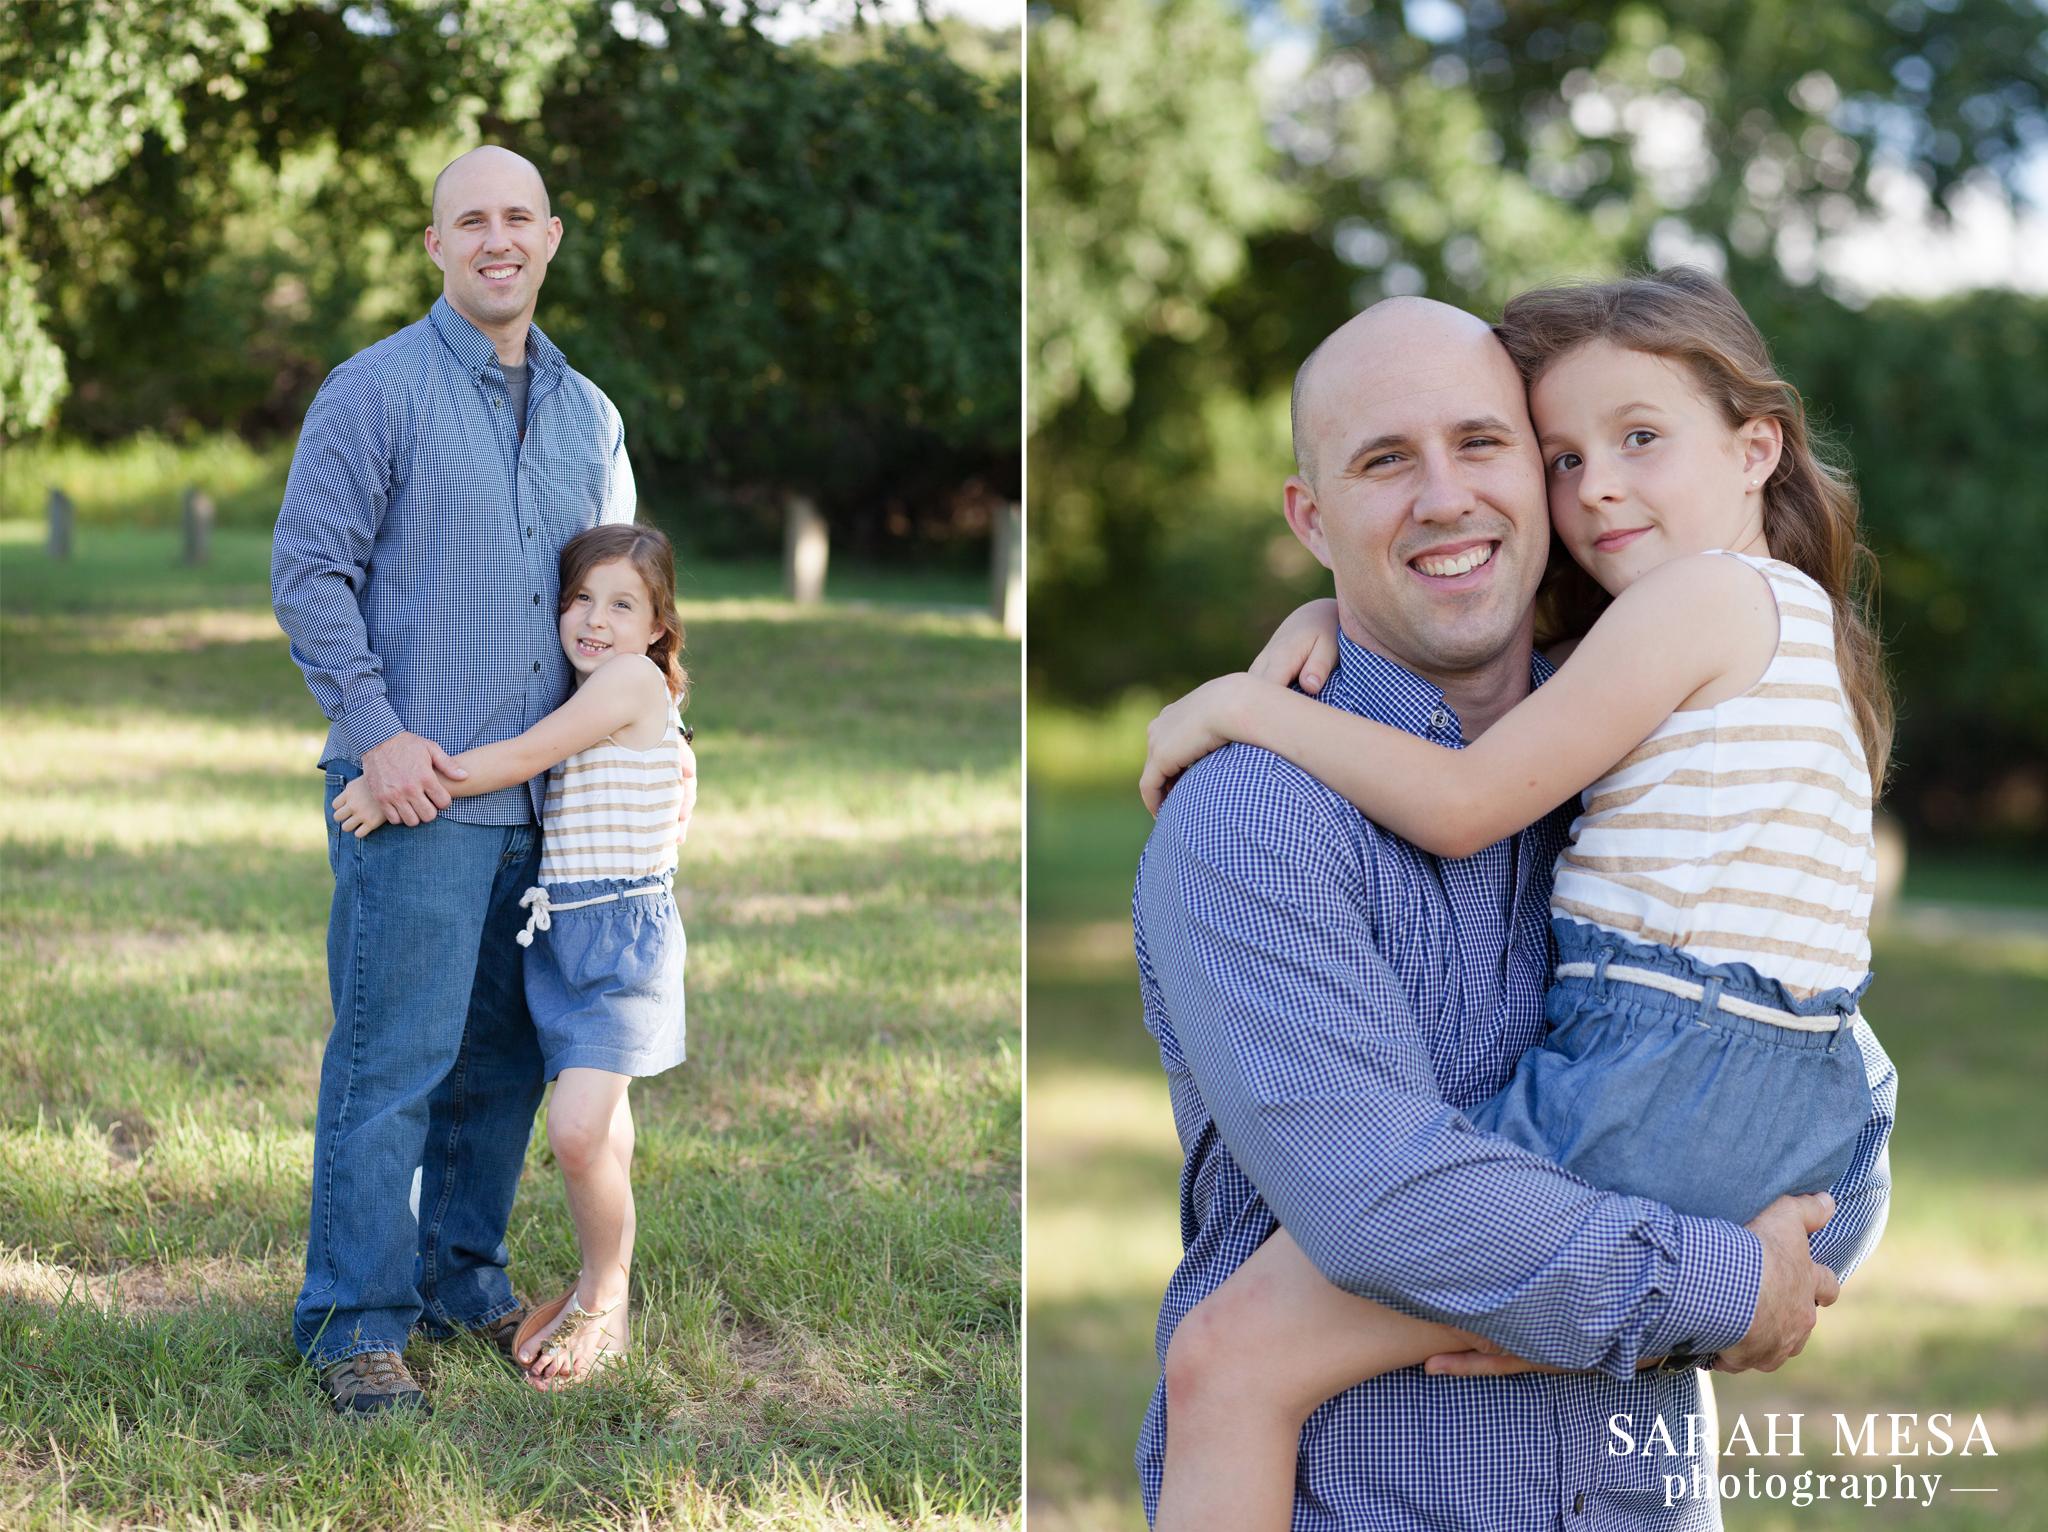 Sarah Mesa Photography | Louisville, KY Wedding and Portrait Photographer